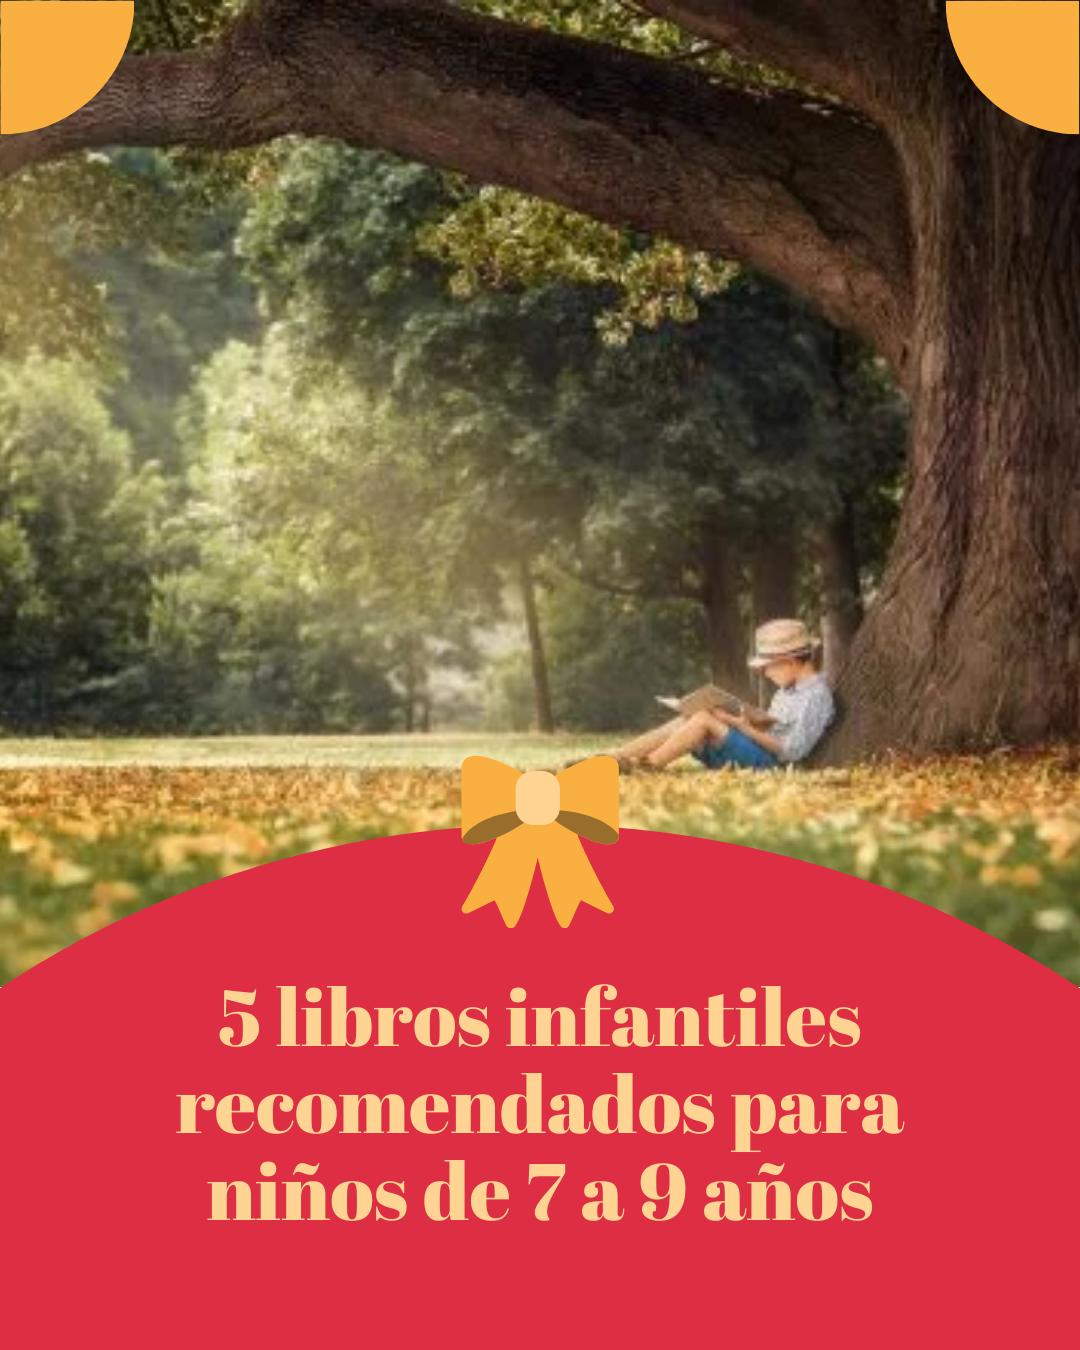 5 Libros Infantiles Recomendados Para Niños De 7 A 9 Años Eres Mamá Libros Infantiles Recomendados Libros Recomendados Para Niños Niños